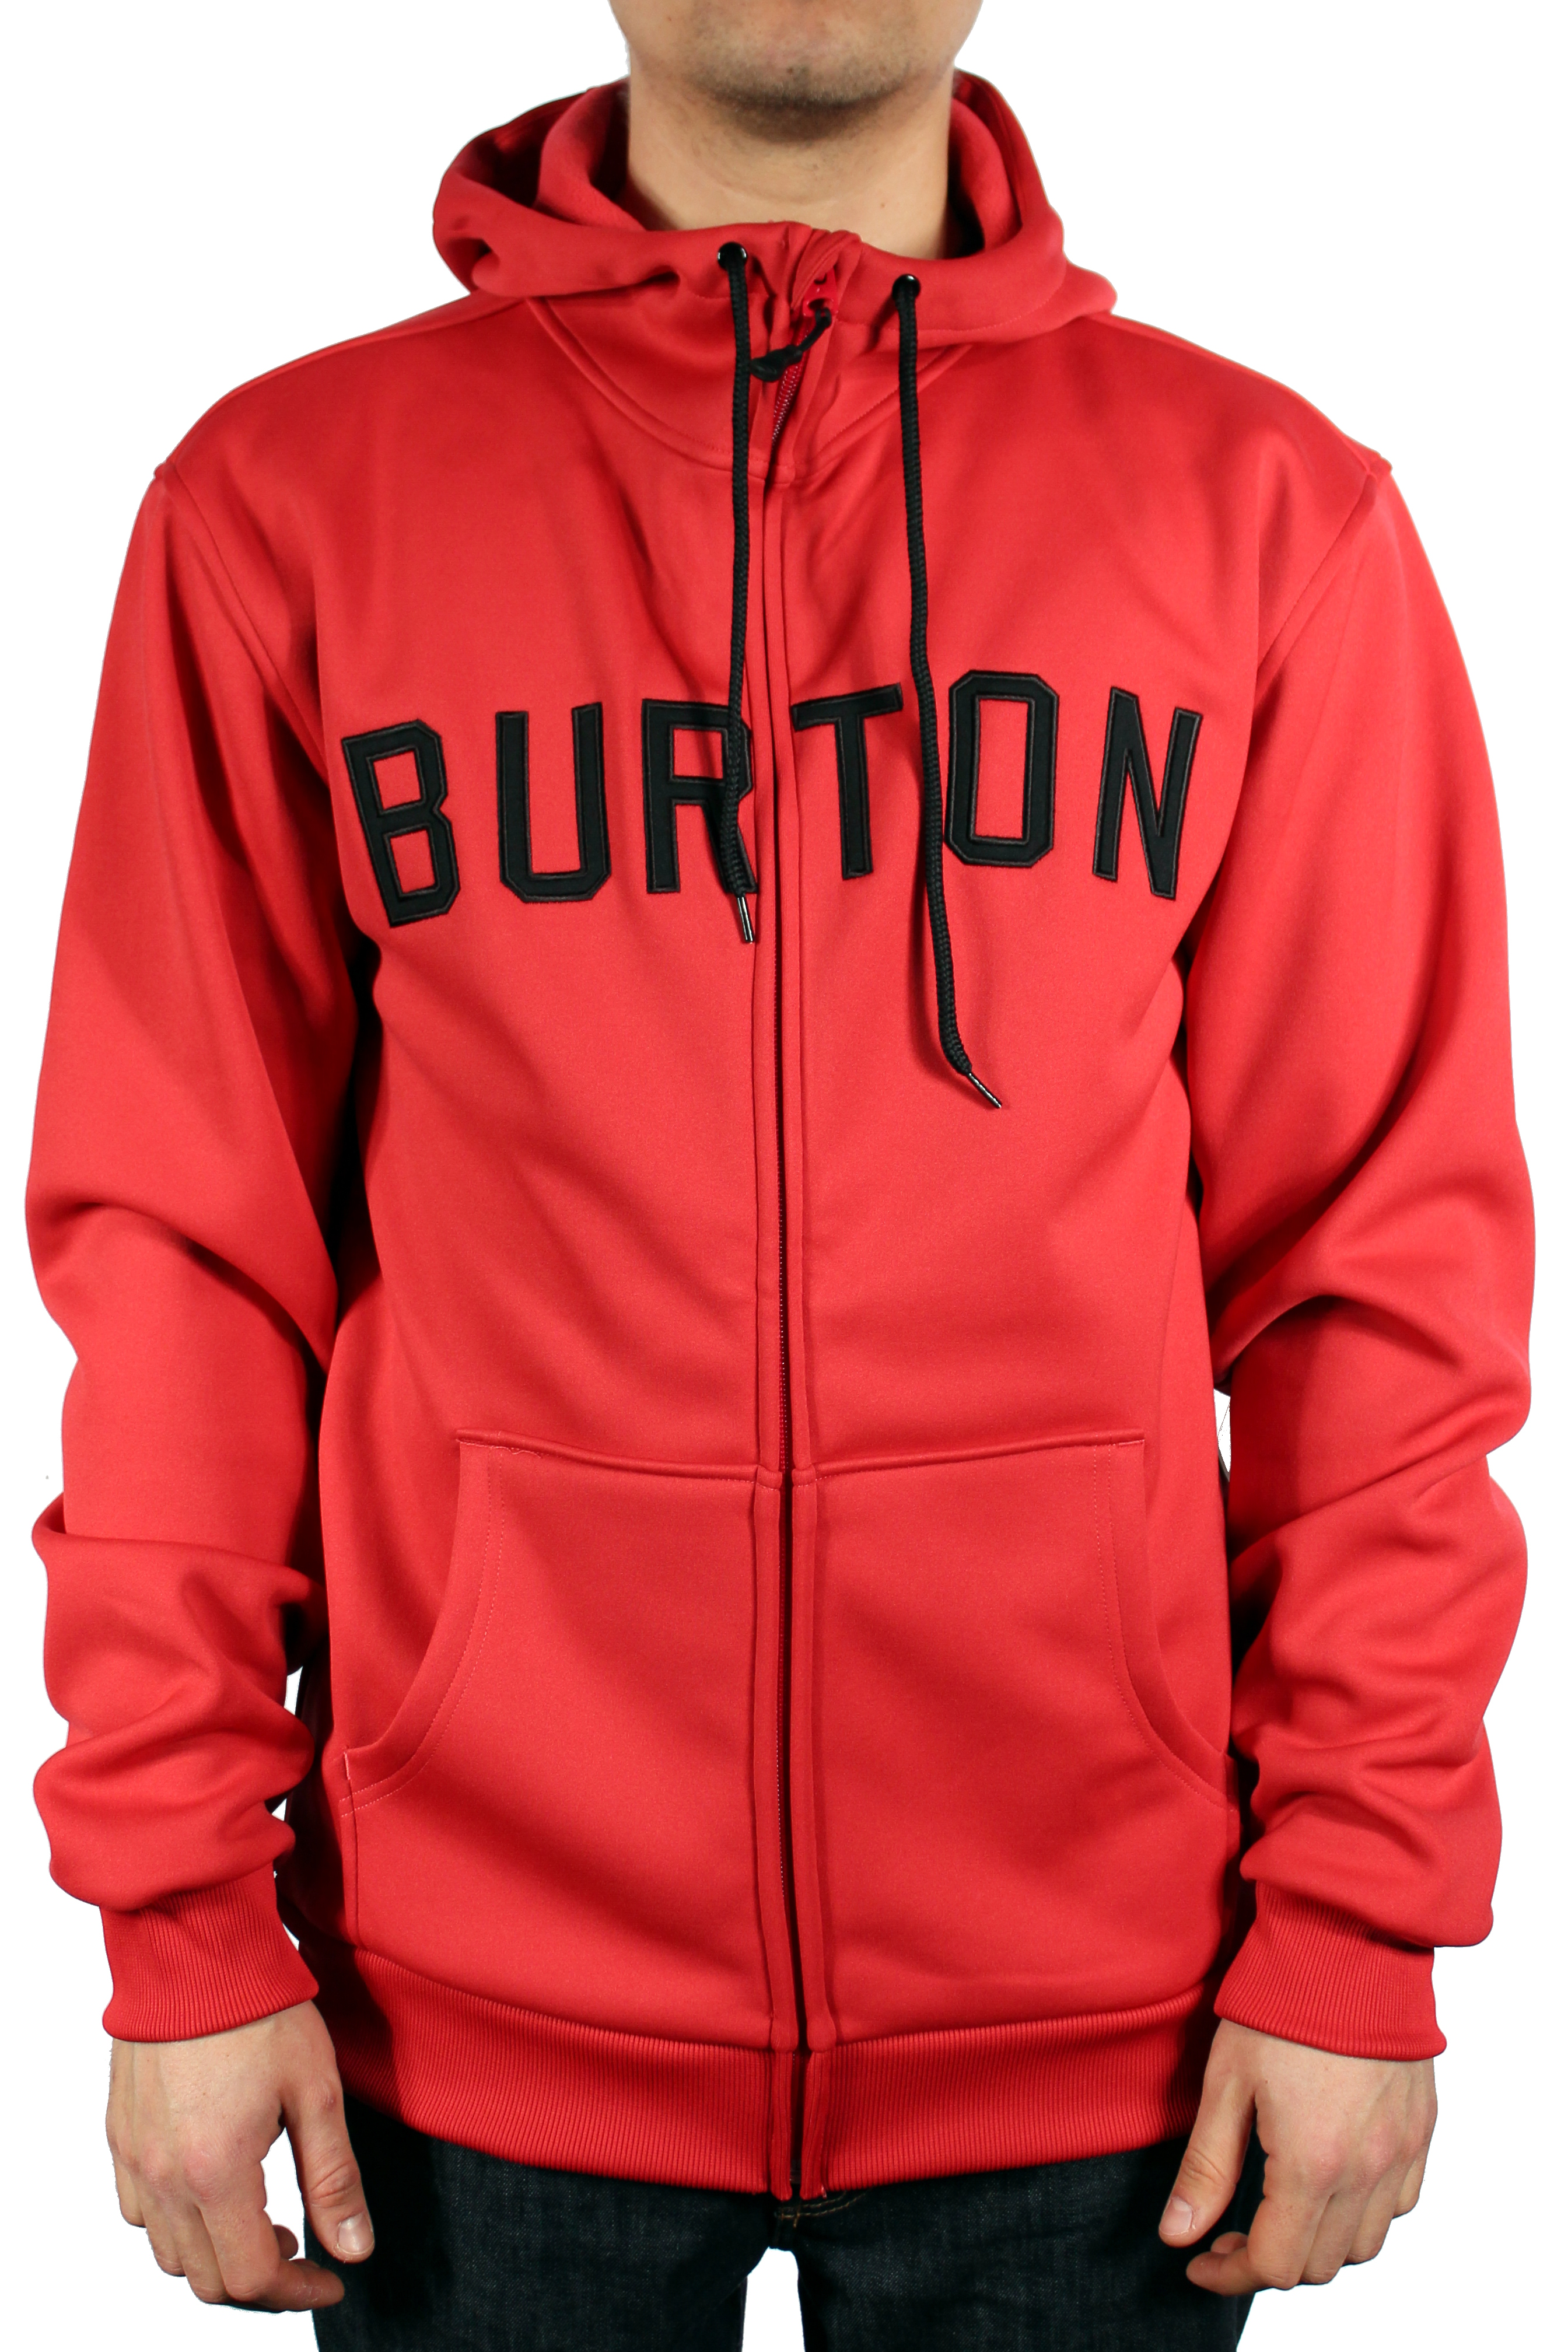 Bluza Aktywna Burton Bonded Hdd (Kindling)